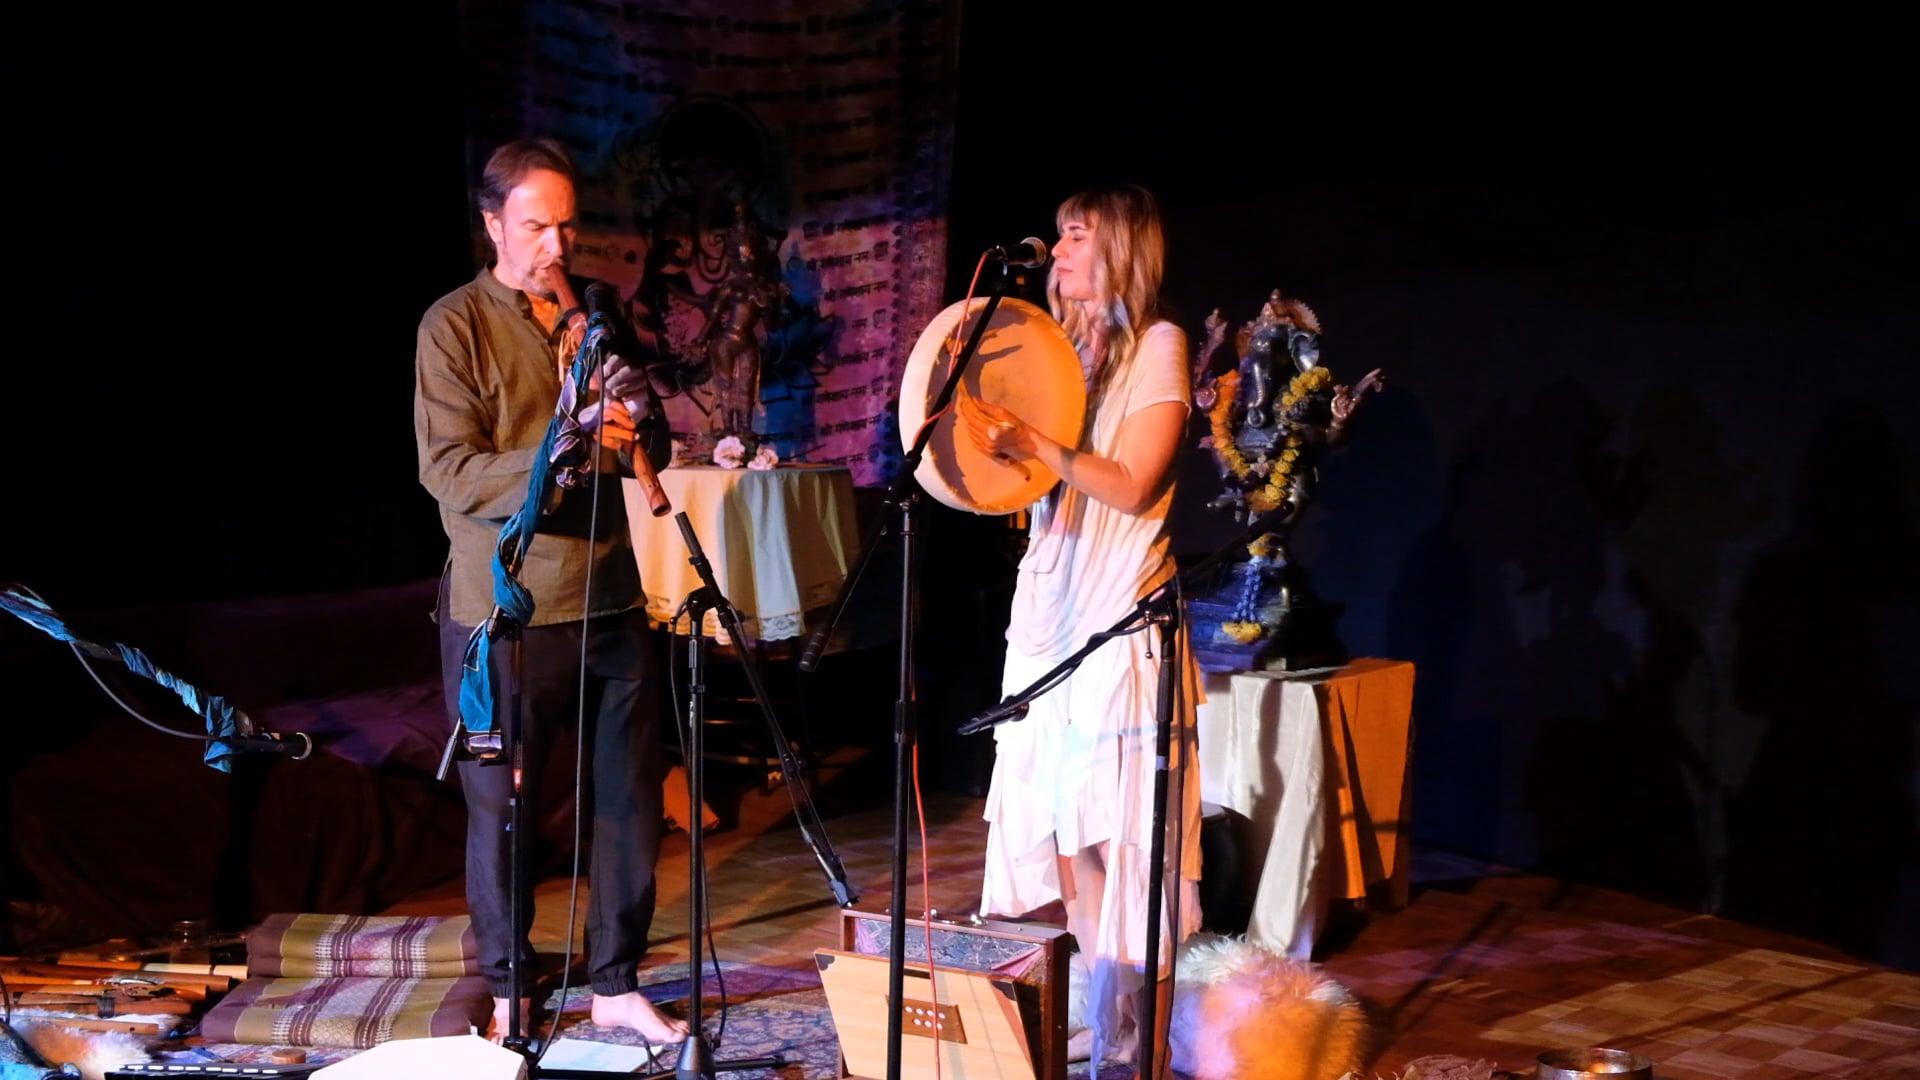 James Marienthal with Cypress Dubin at Key Tea, San Rafael, CA 11.03.18